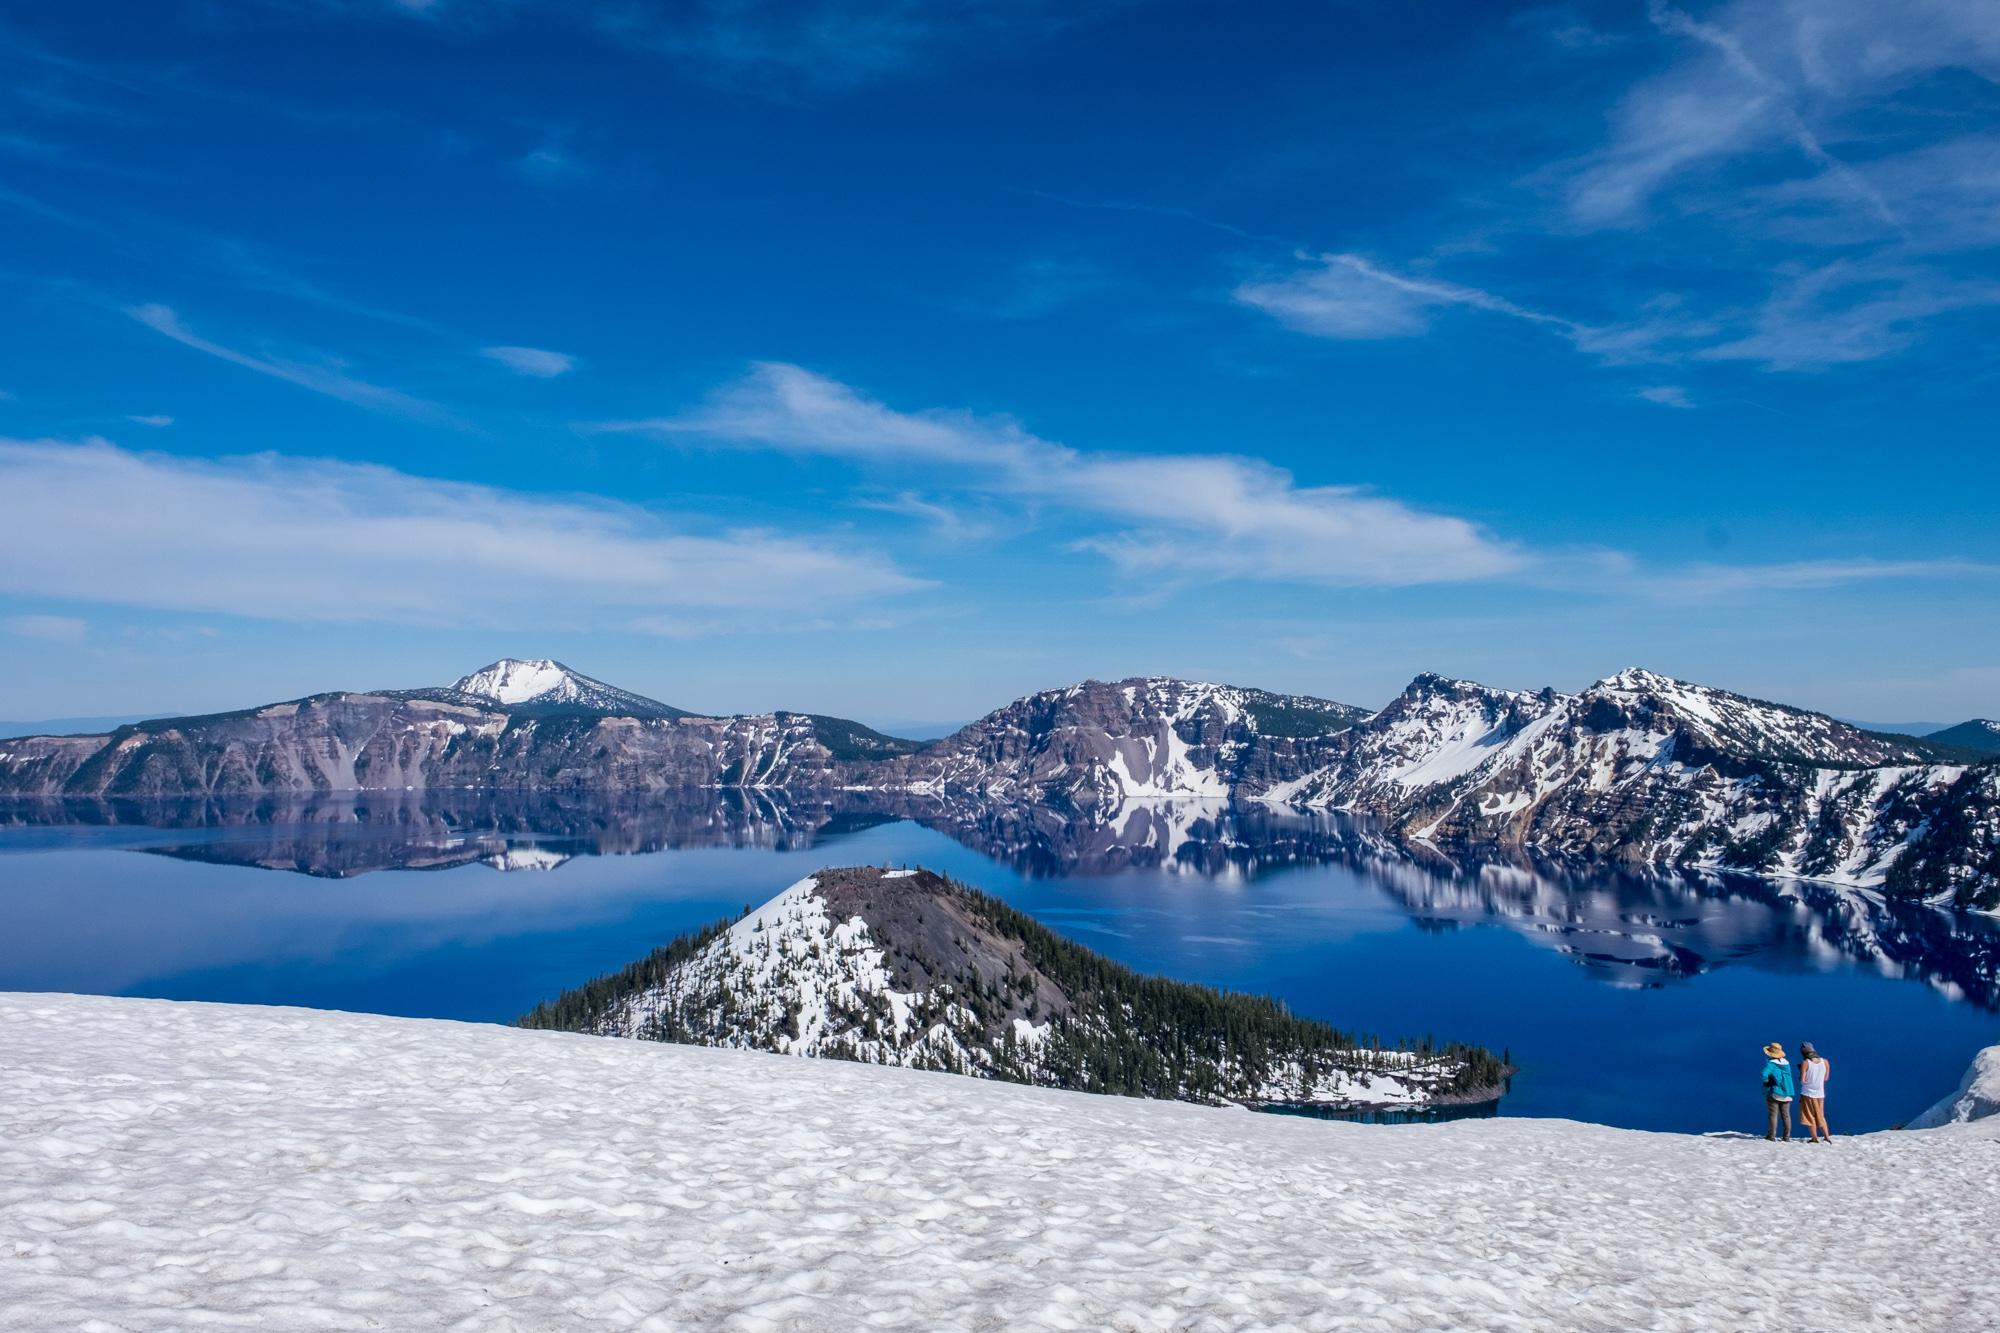 Crater Lake National Park - 008.jpg